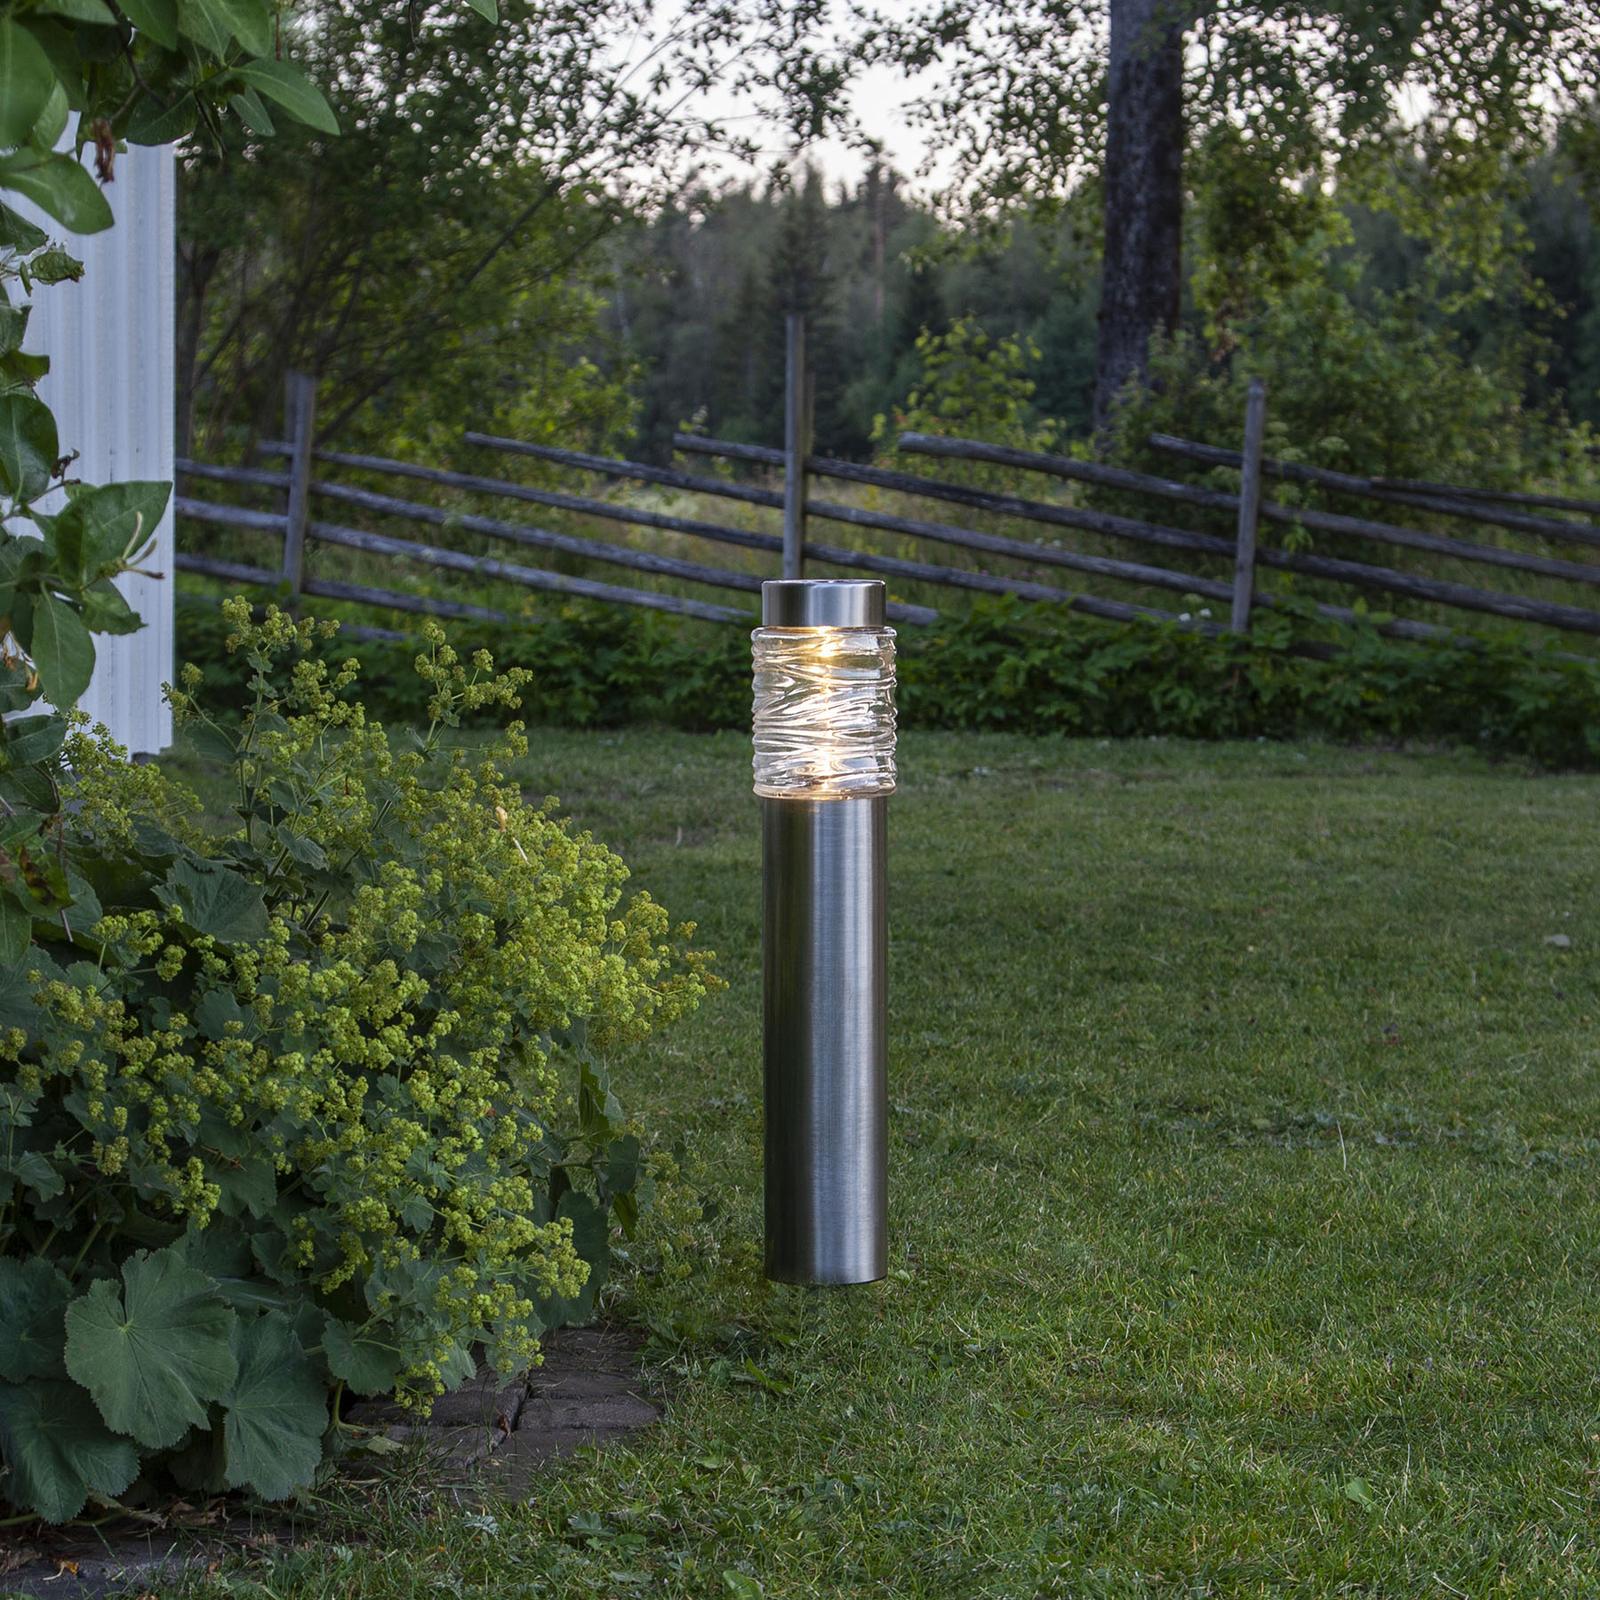 Lampa solarna Capri - autarkiczna lampa cokołowa